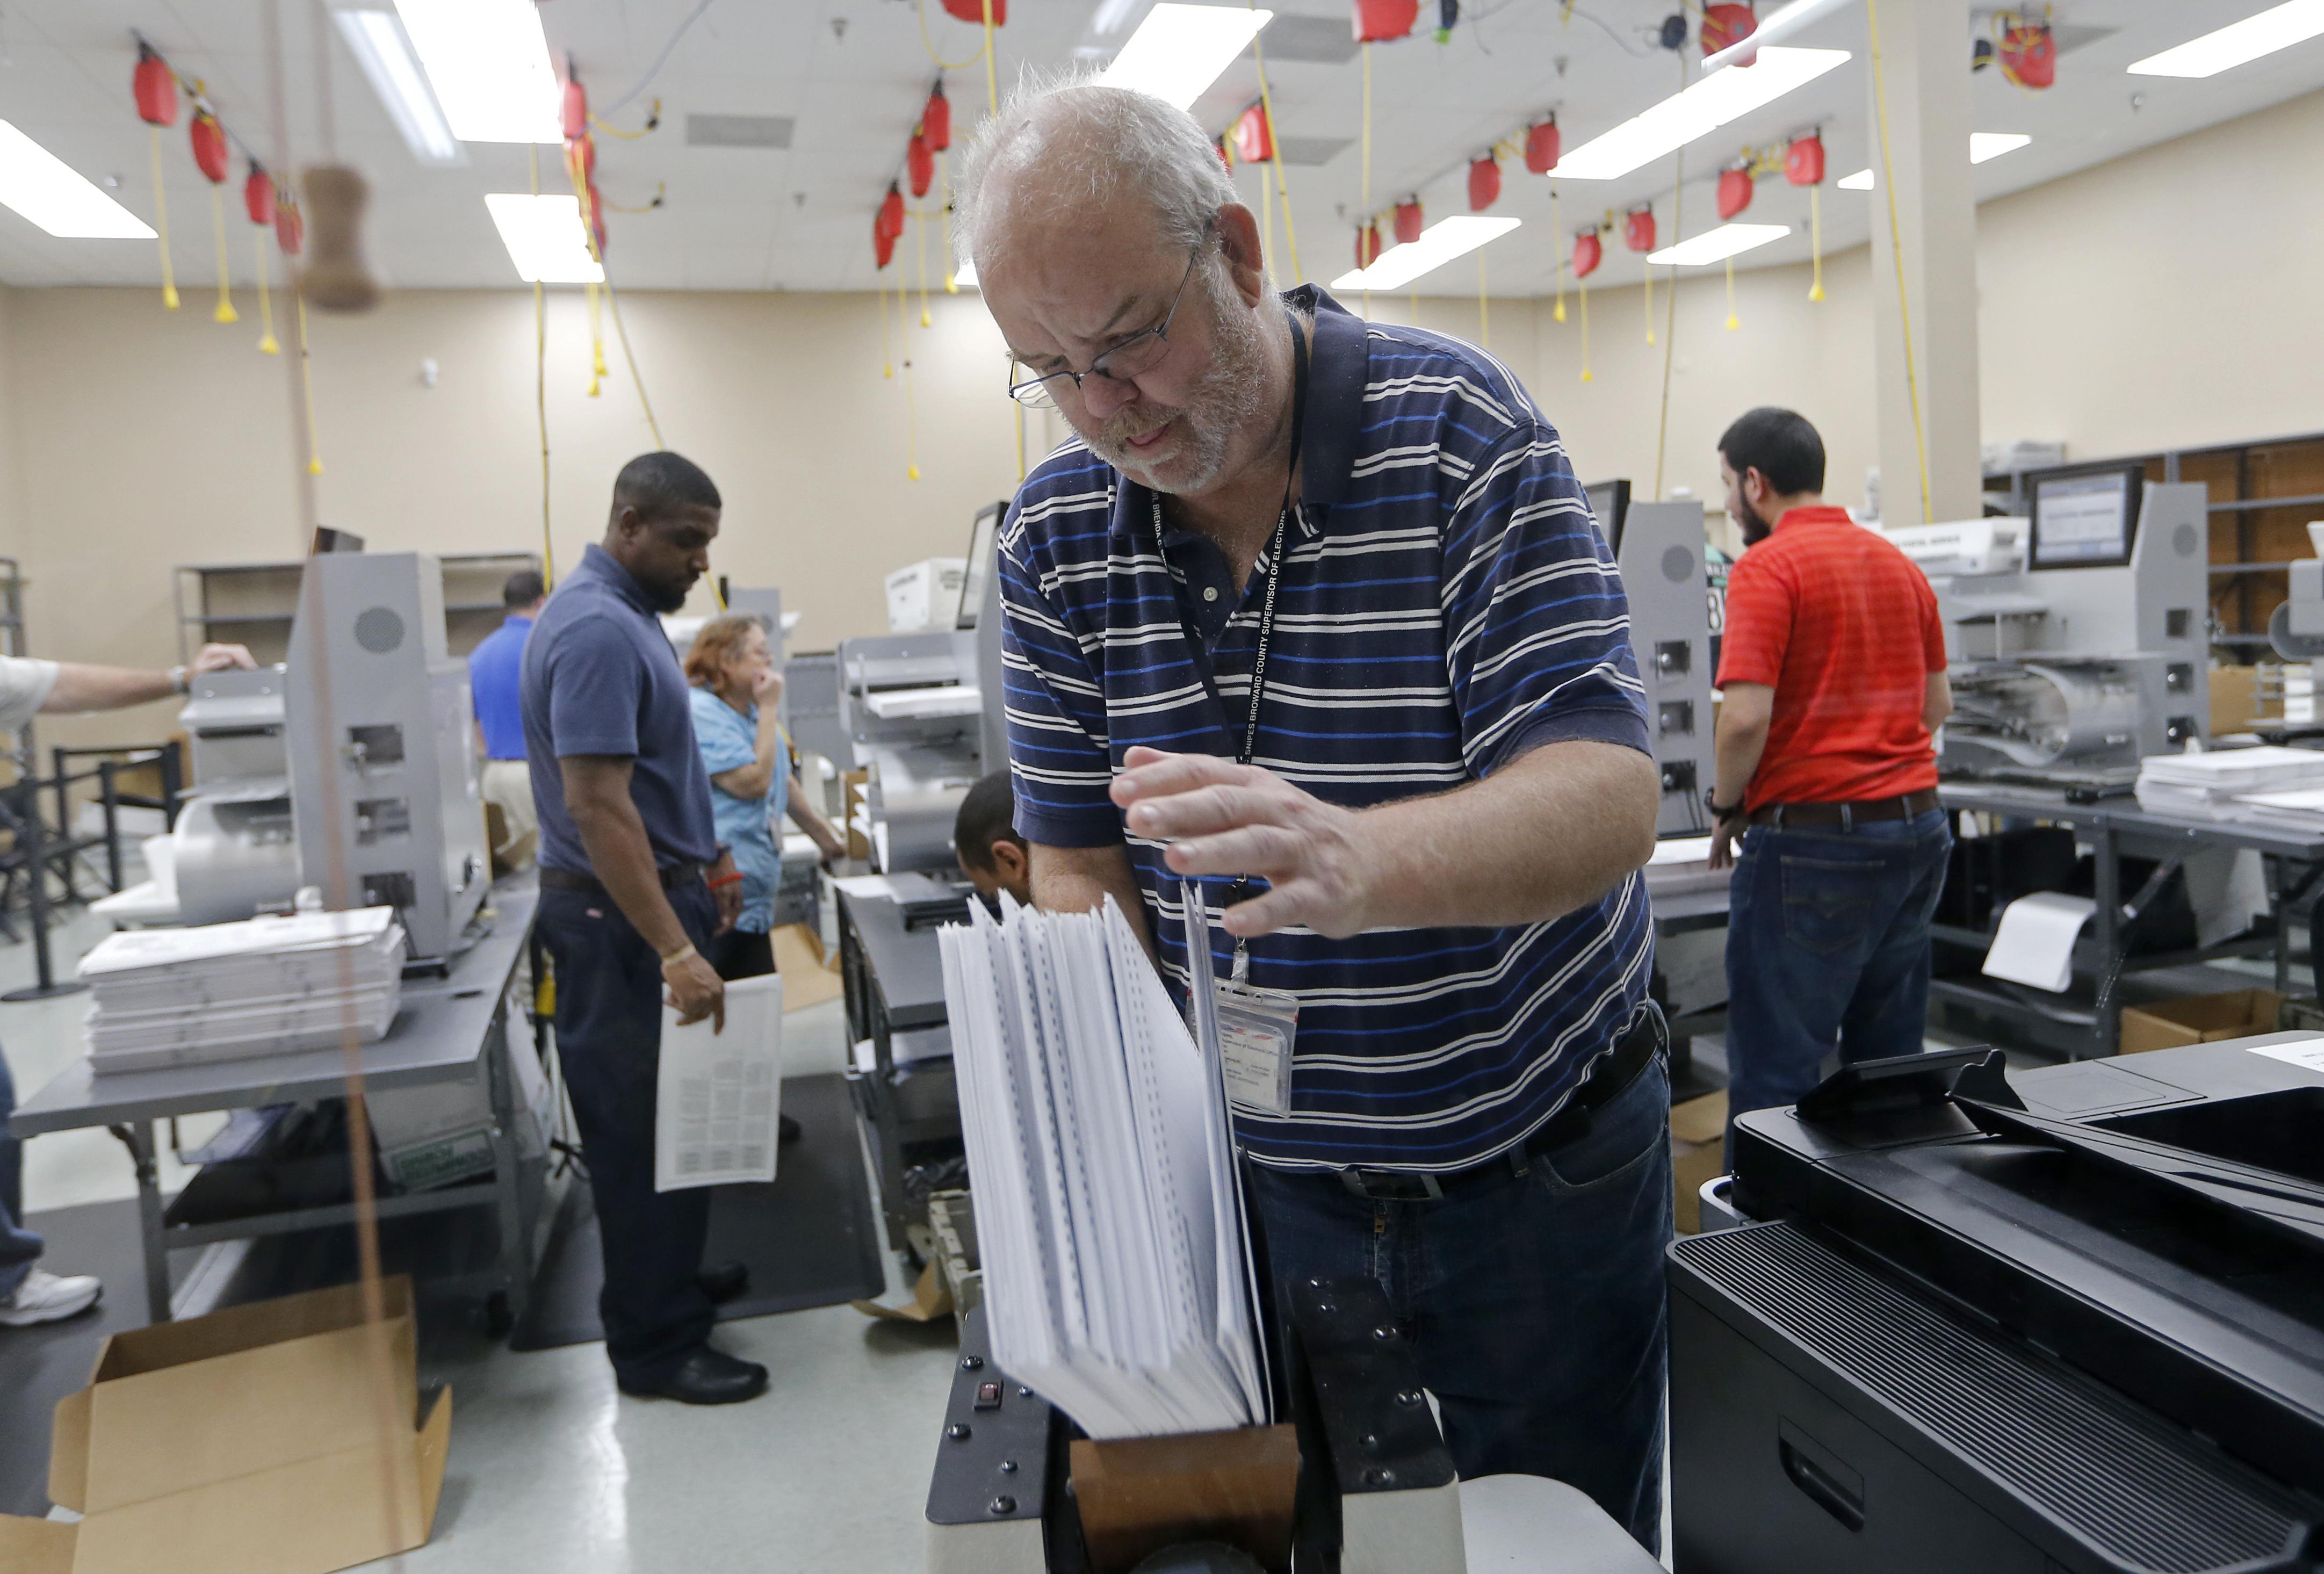 A Broward County election official arranges ballots for a recount.